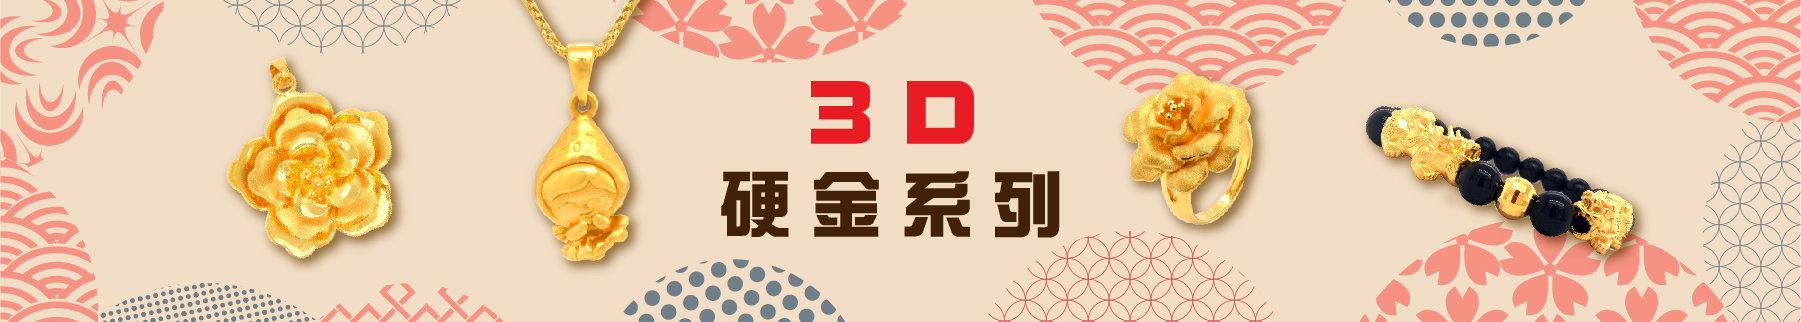 3d更金banner-04.jpg